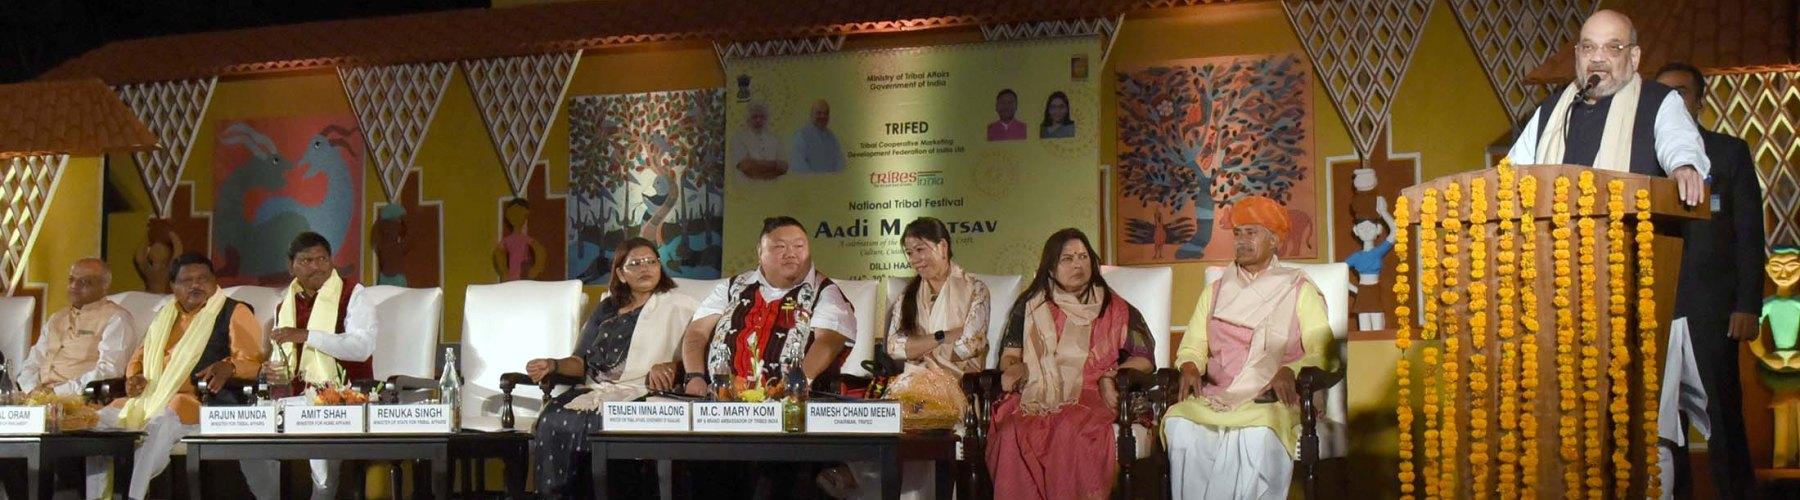 Union Minister for Home Affairs, Shri Amit Shah inaugurated the National Tribal Festival 'Aadi Mahotsav', in New Delhi on November 16, 2019.